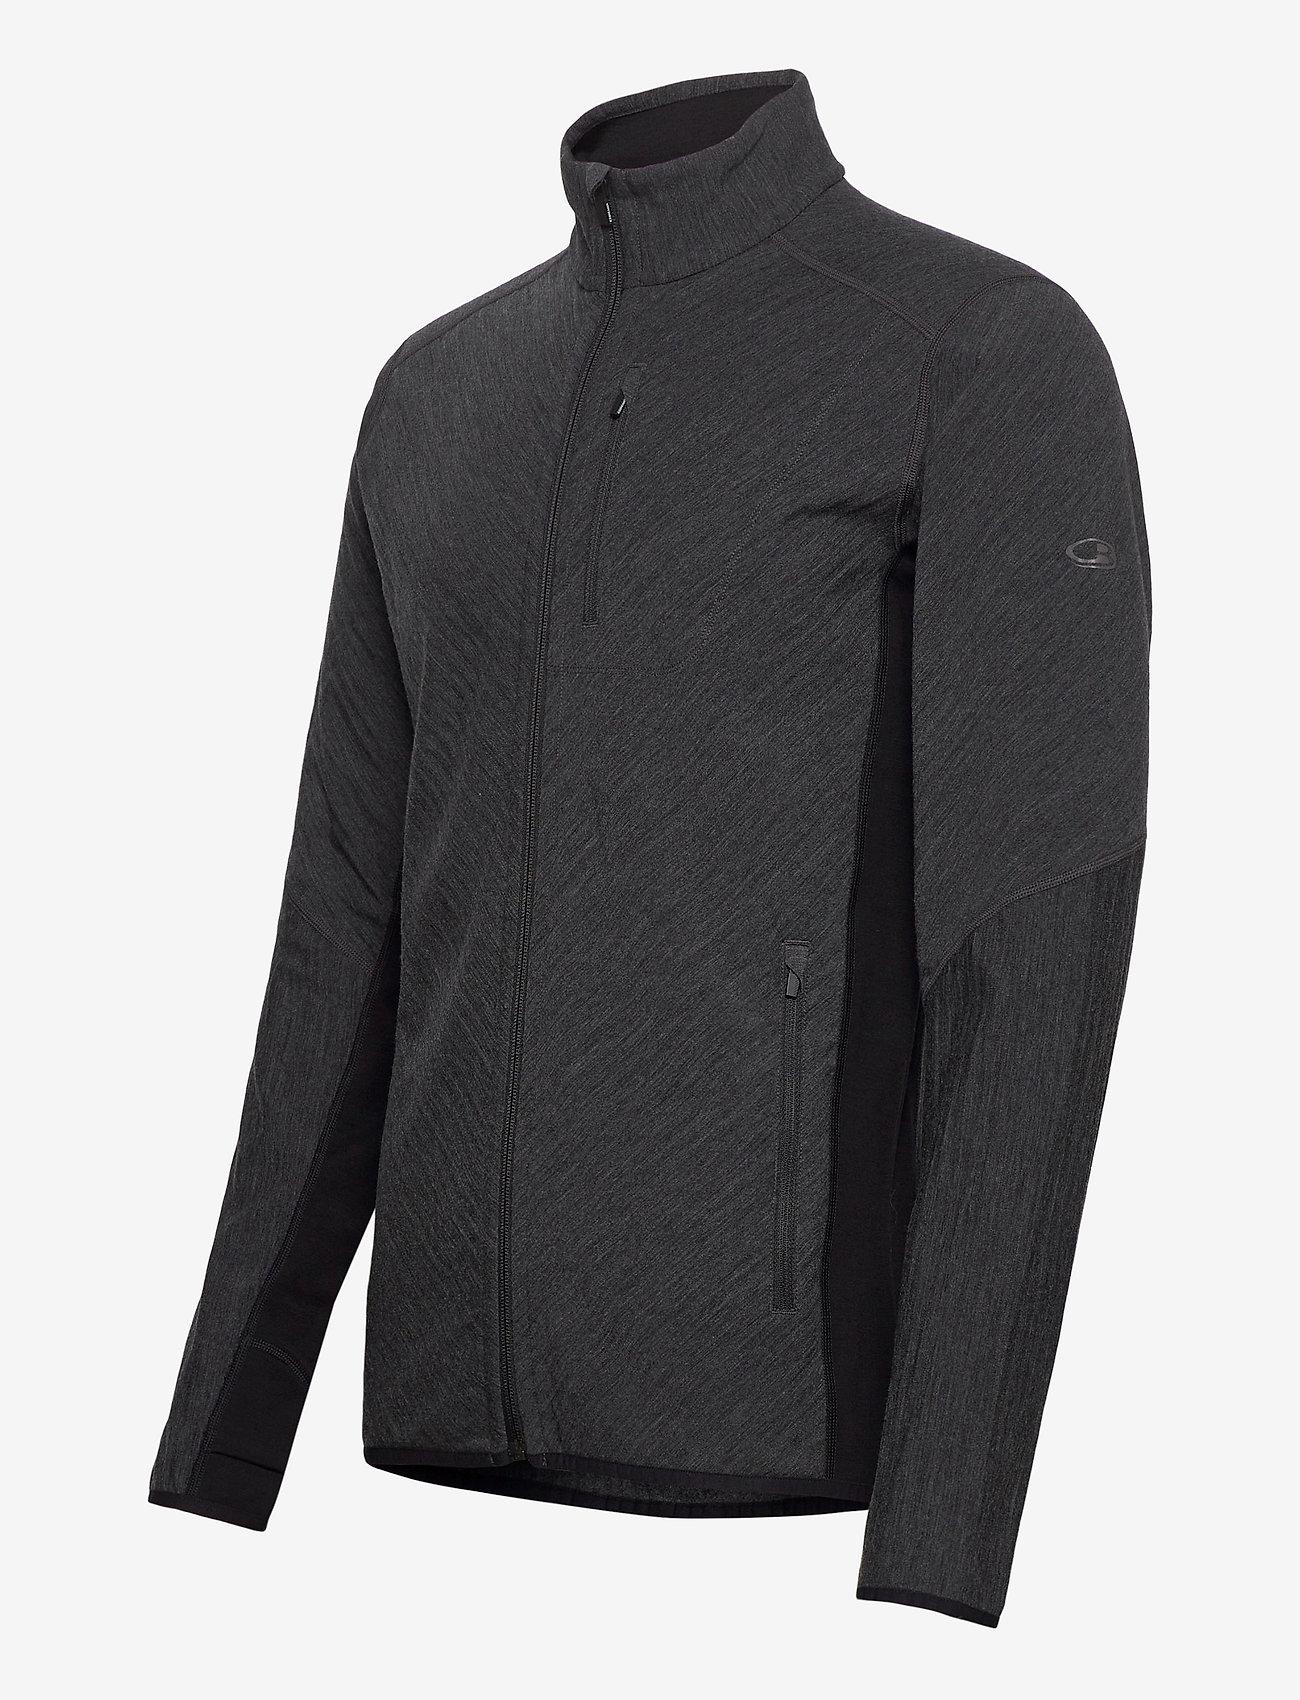 Icebreaker Mens Descender LS Zip - Sweatshirts JET HTHR/BLACK - Menn Klær